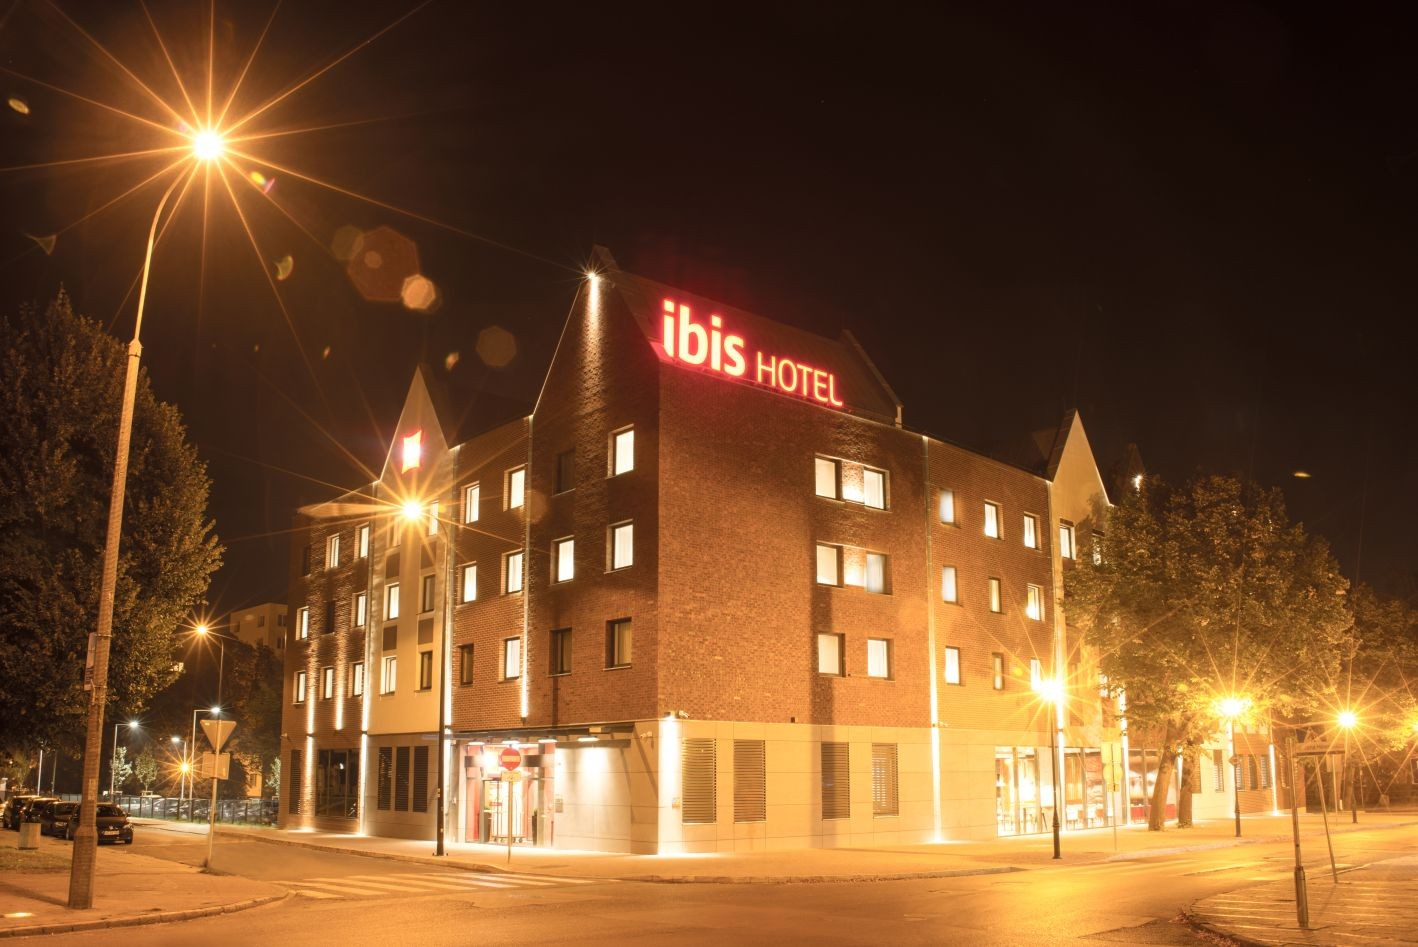 Ibis Gdańsk Old Town Hotel